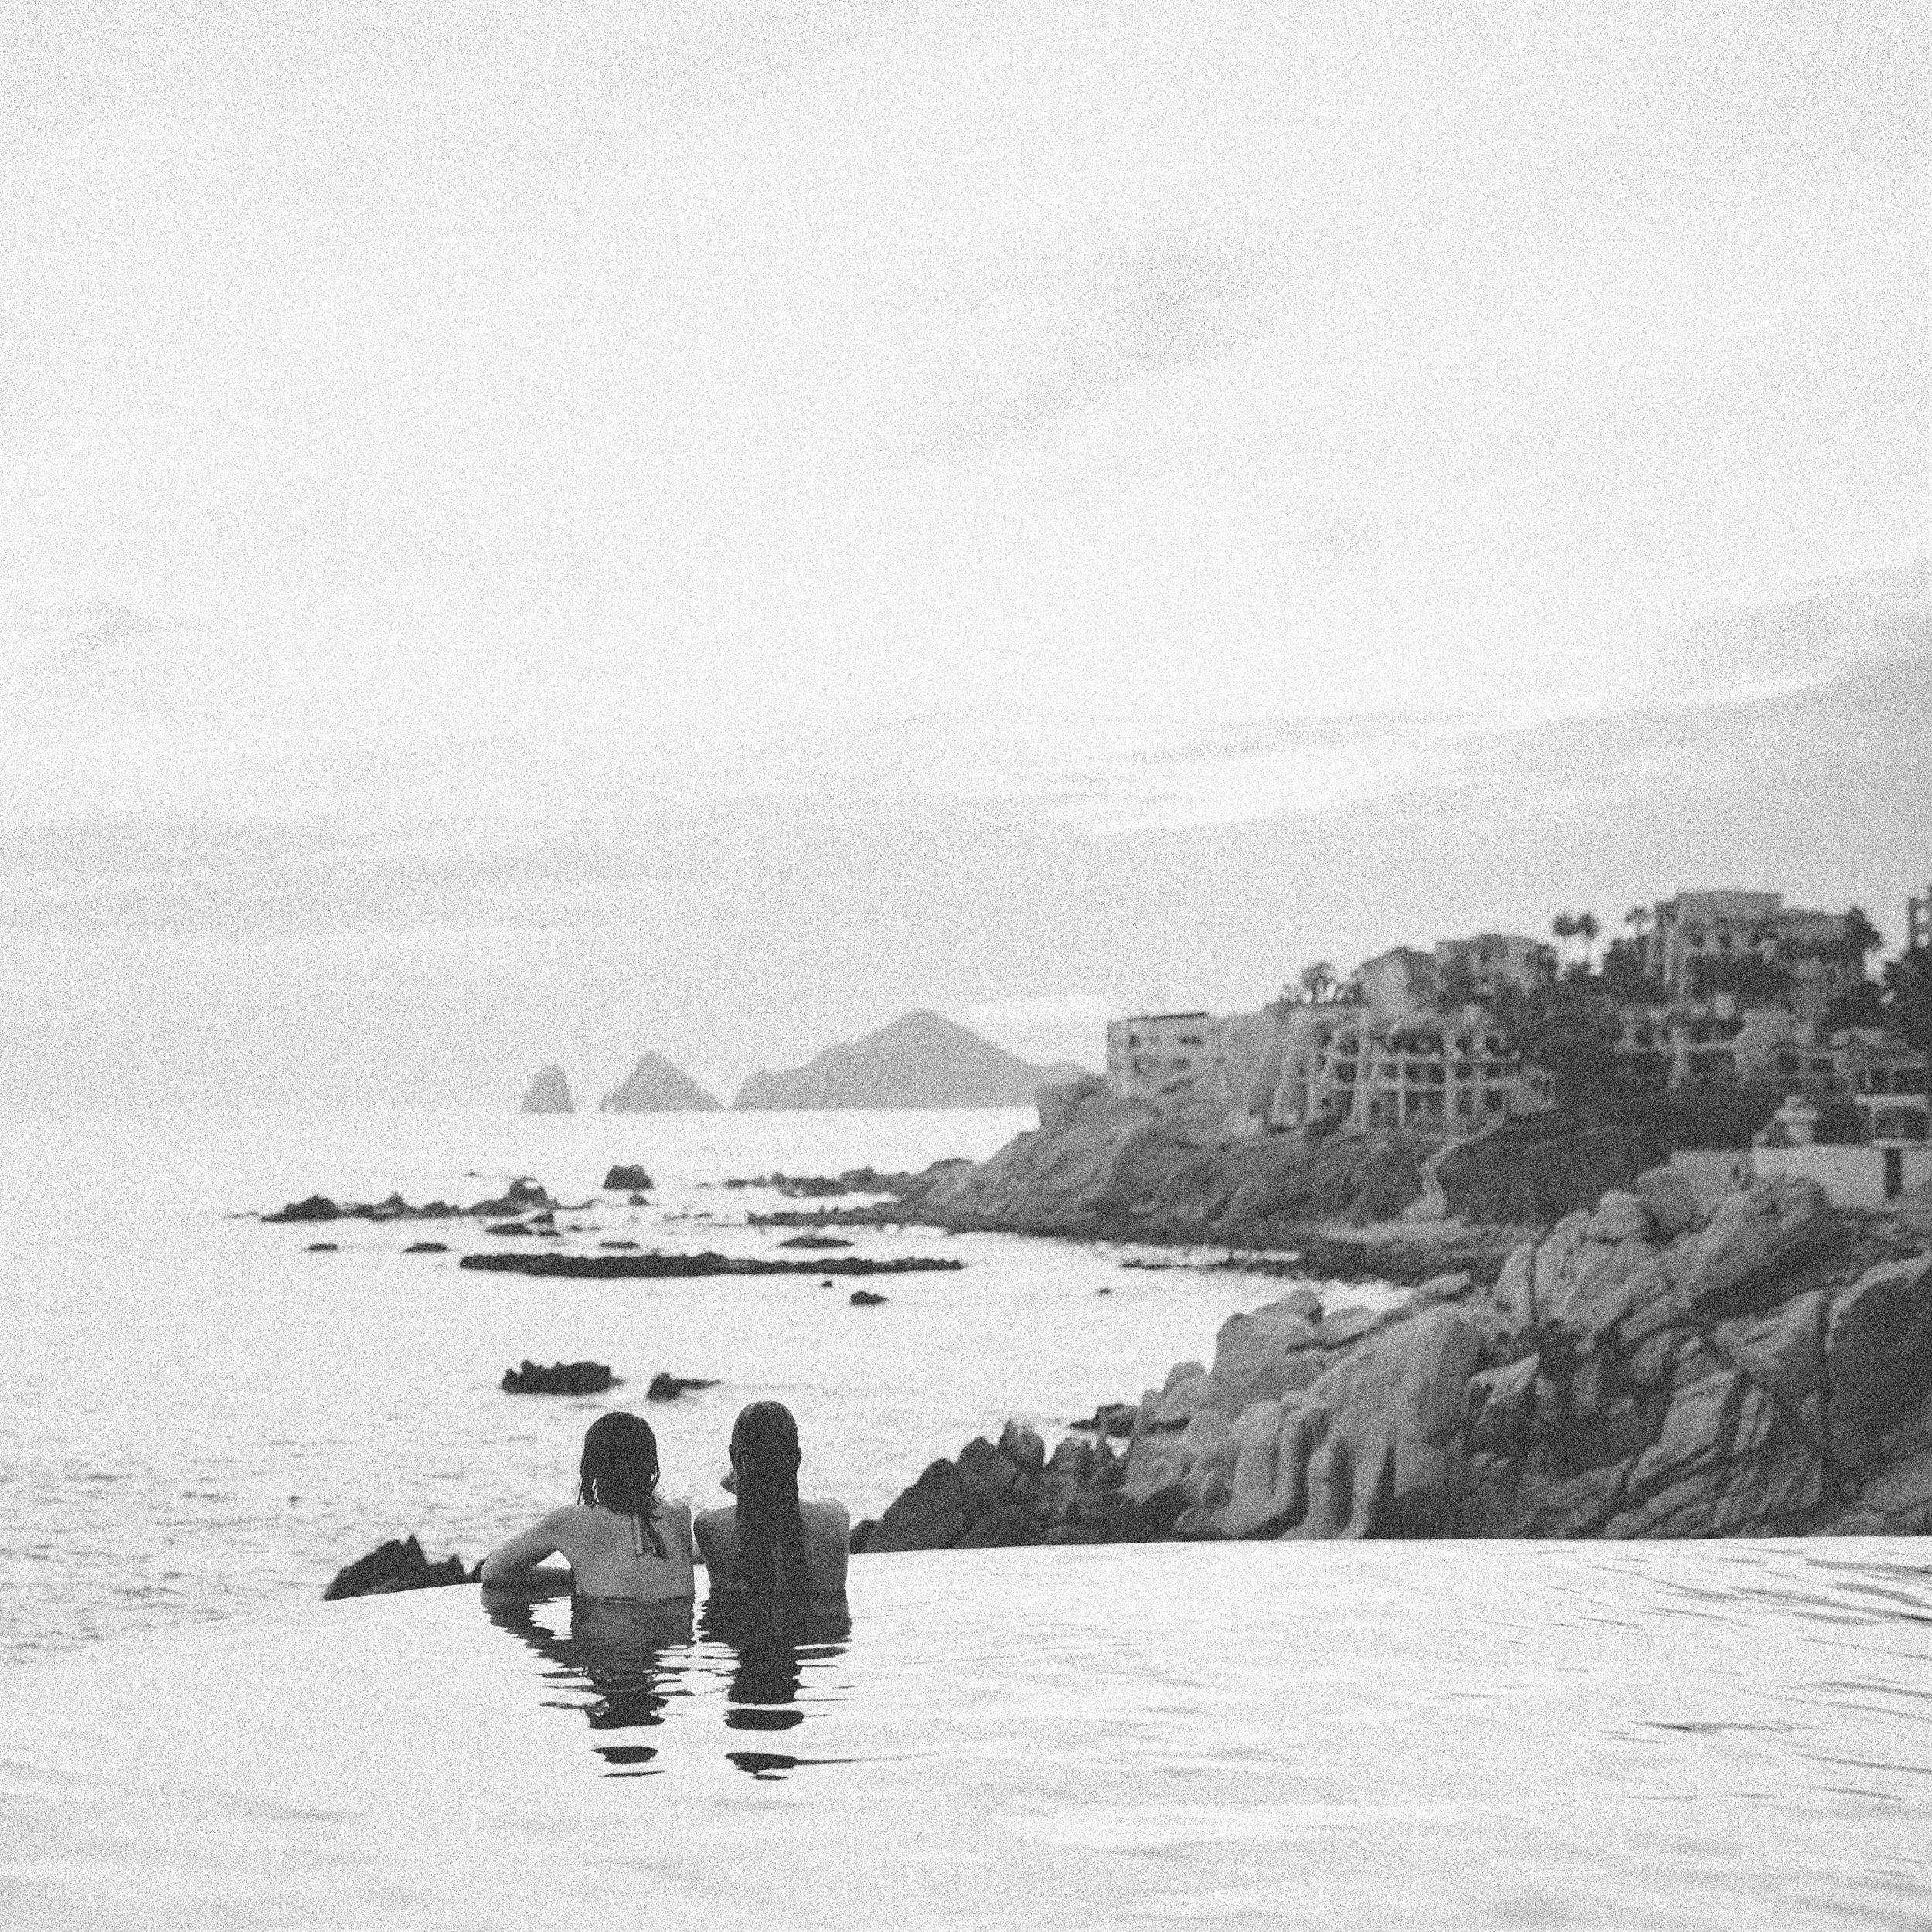 Cabo_1216_0569-2.jpg